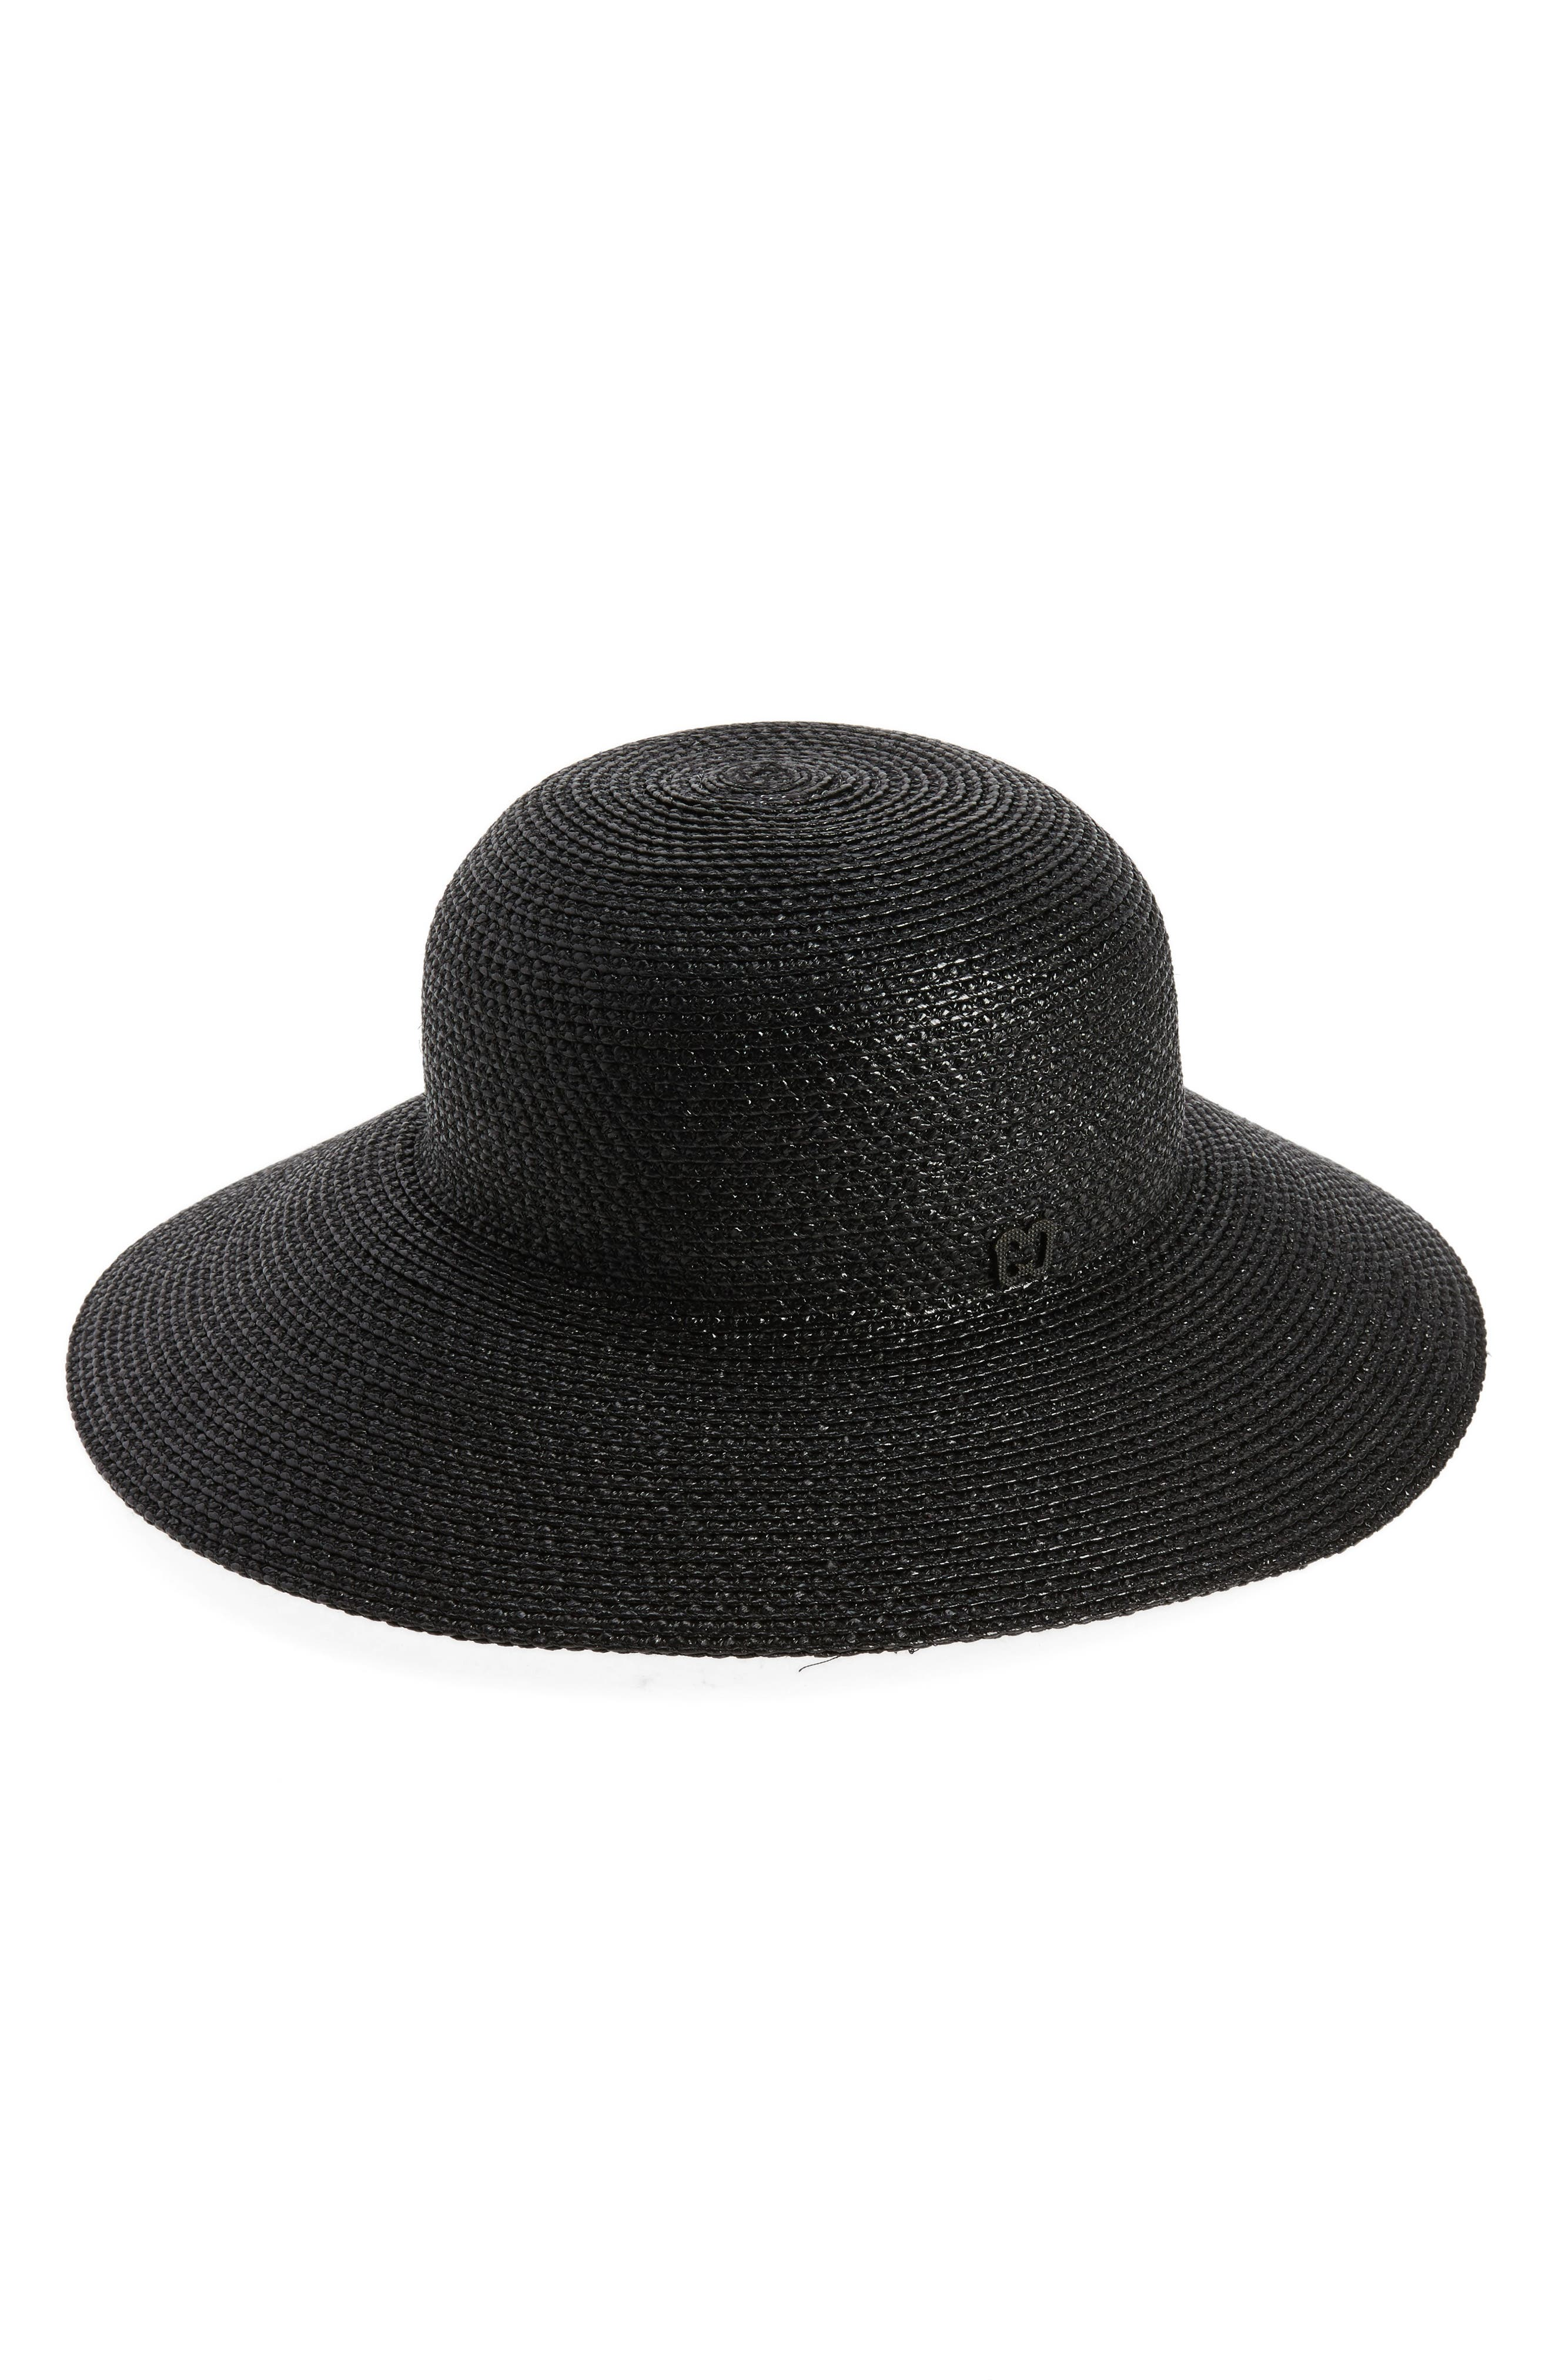 'Squishee<sup>®</sup> IV' Wide Brim Hat,                             Main thumbnail 1, color,                             Black